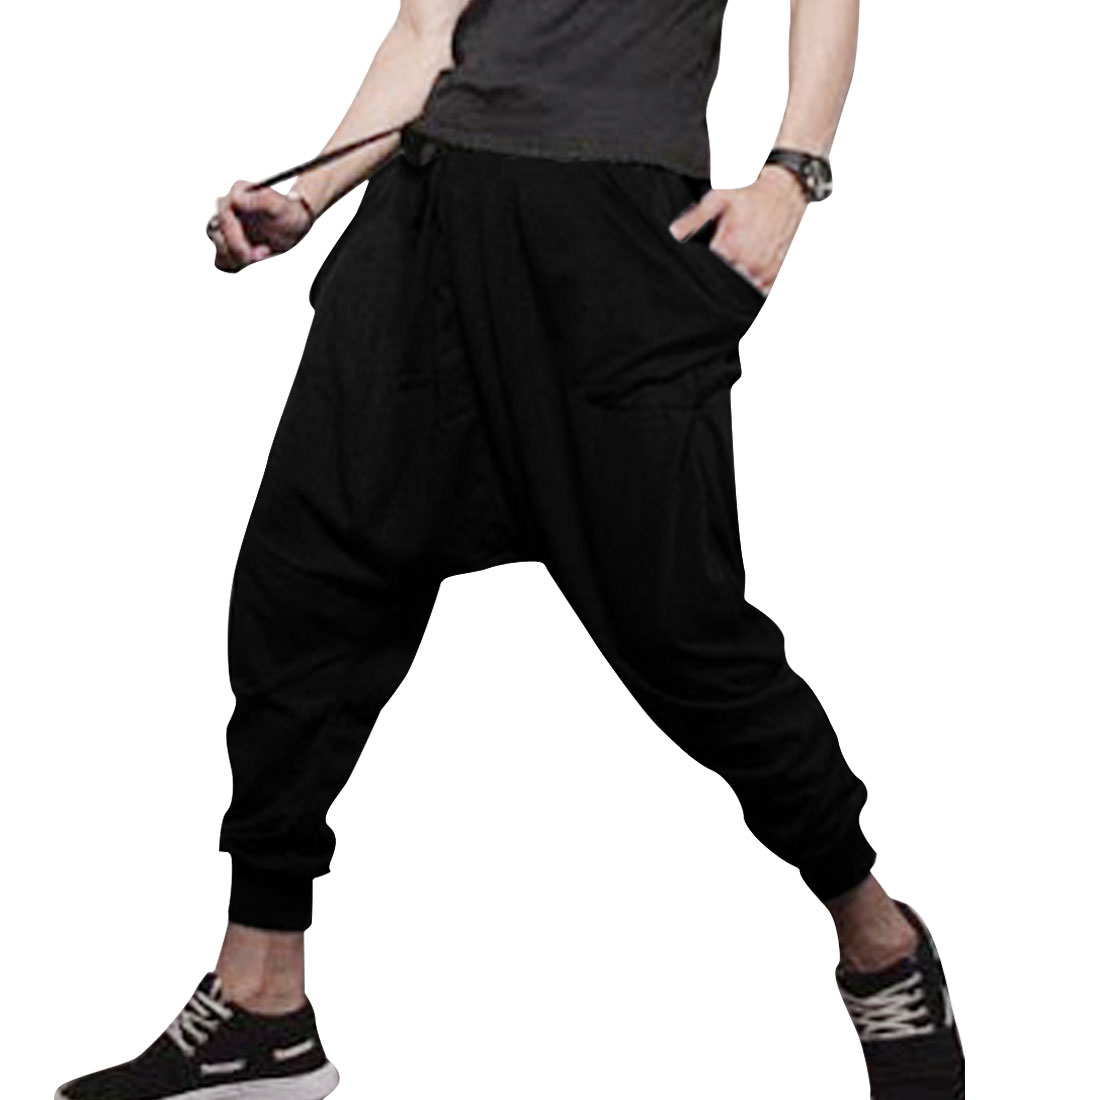 Men Slant Pockets Stretchy Leg Opening Leisure Pants Black W29